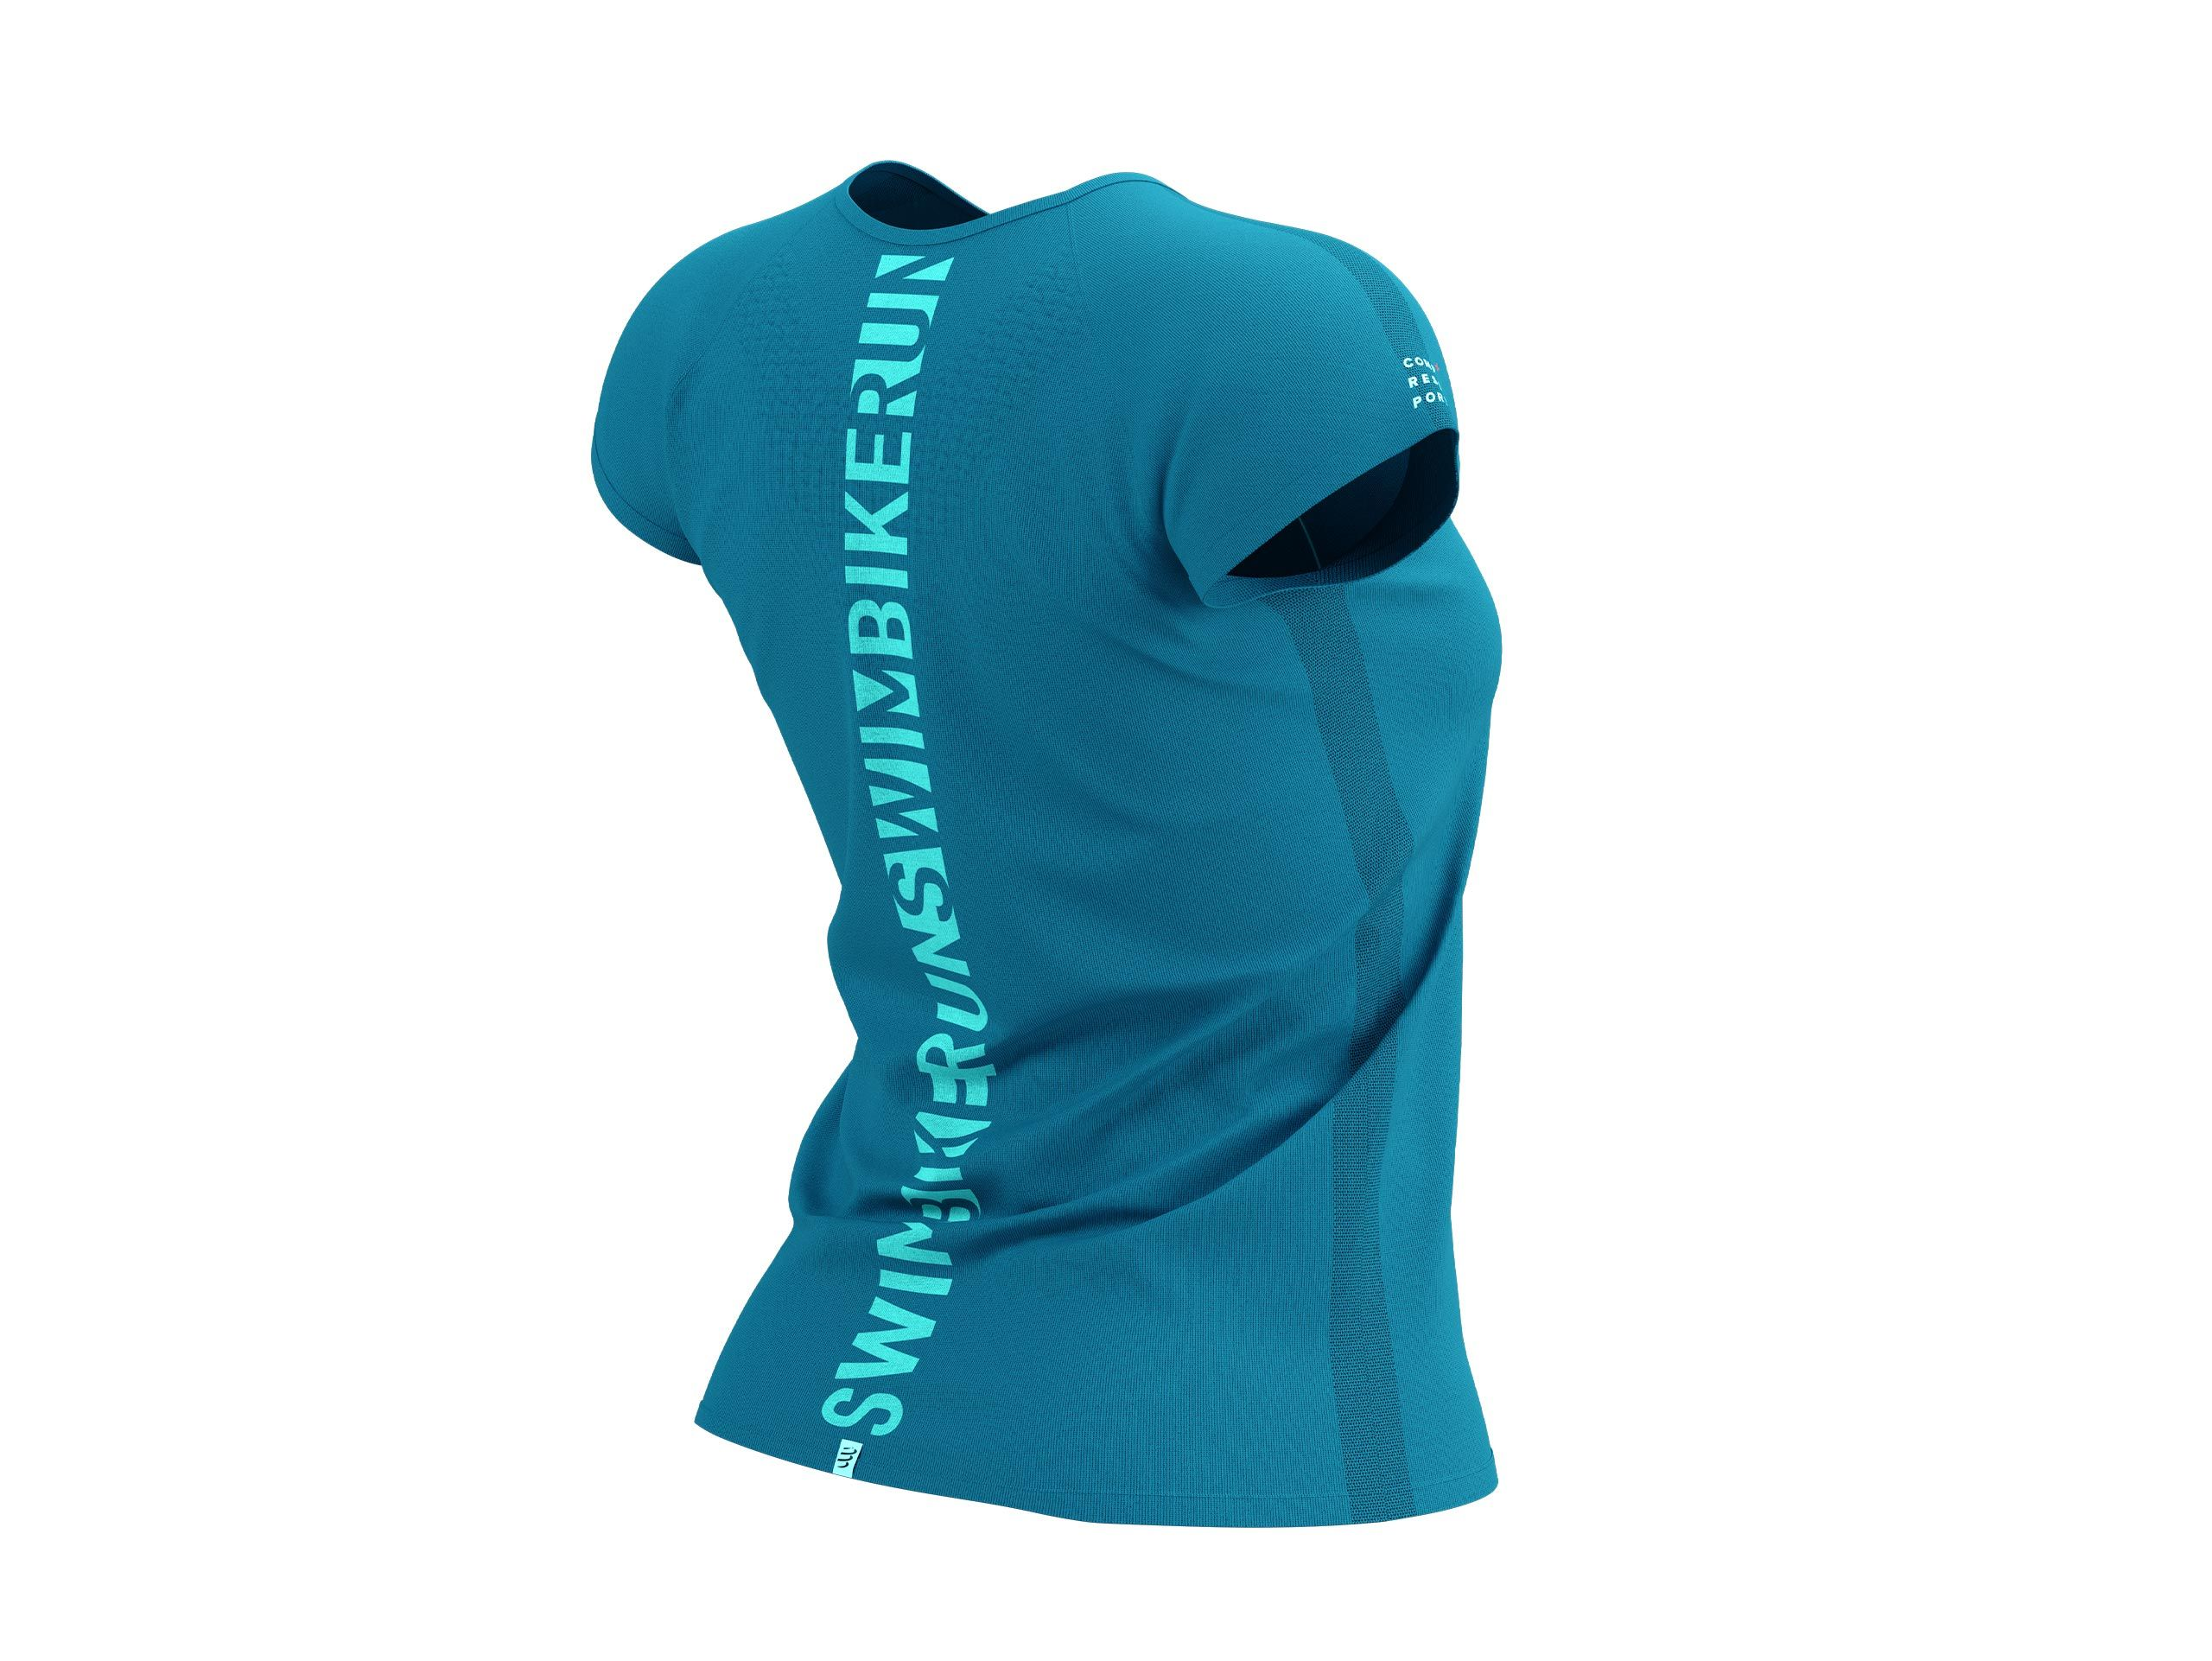 Training Tshirt SS W - Born To SwimBikeRun 2021